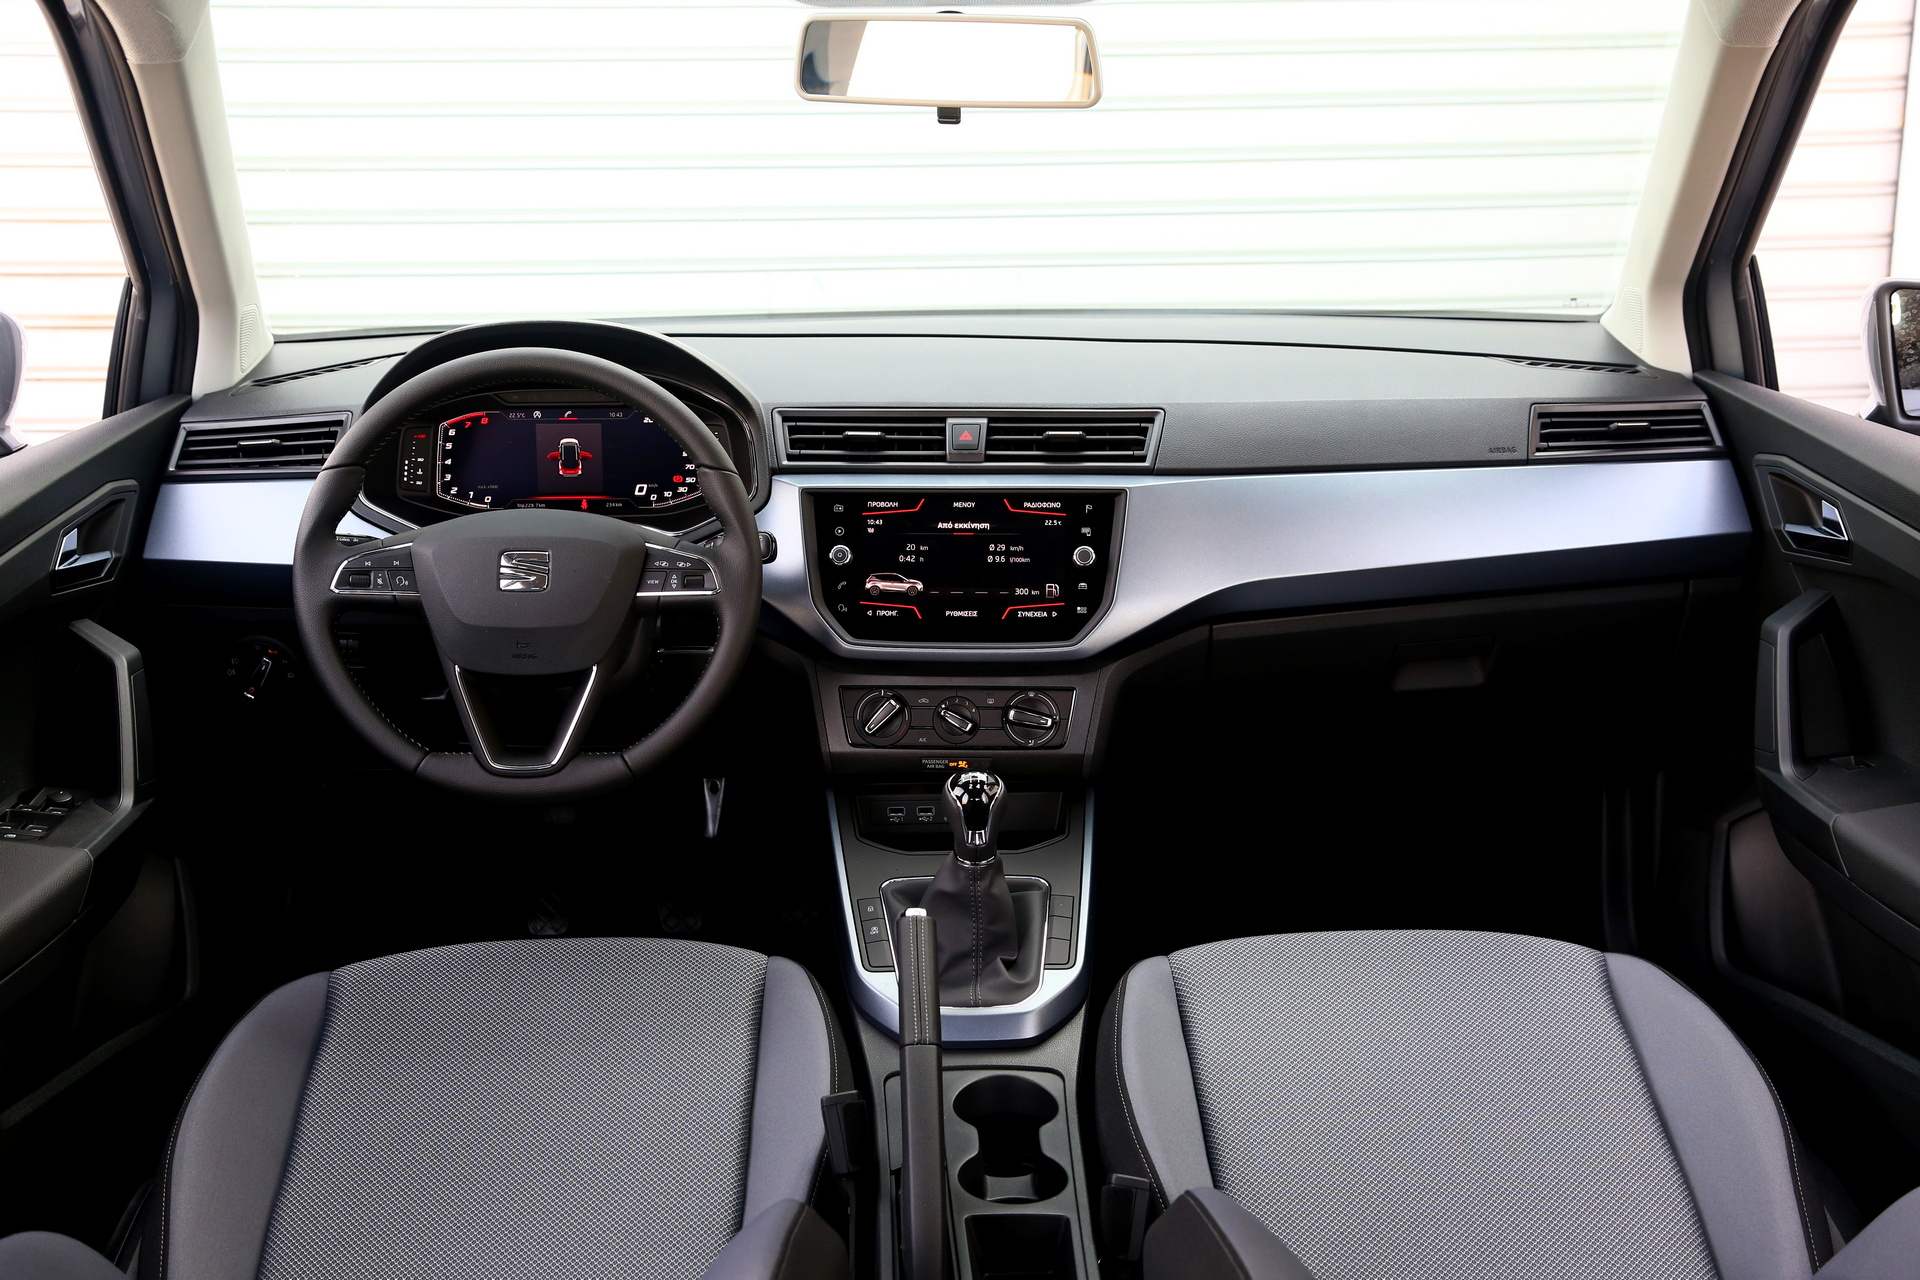 Seat Arona 1.0 TSI 115 PS